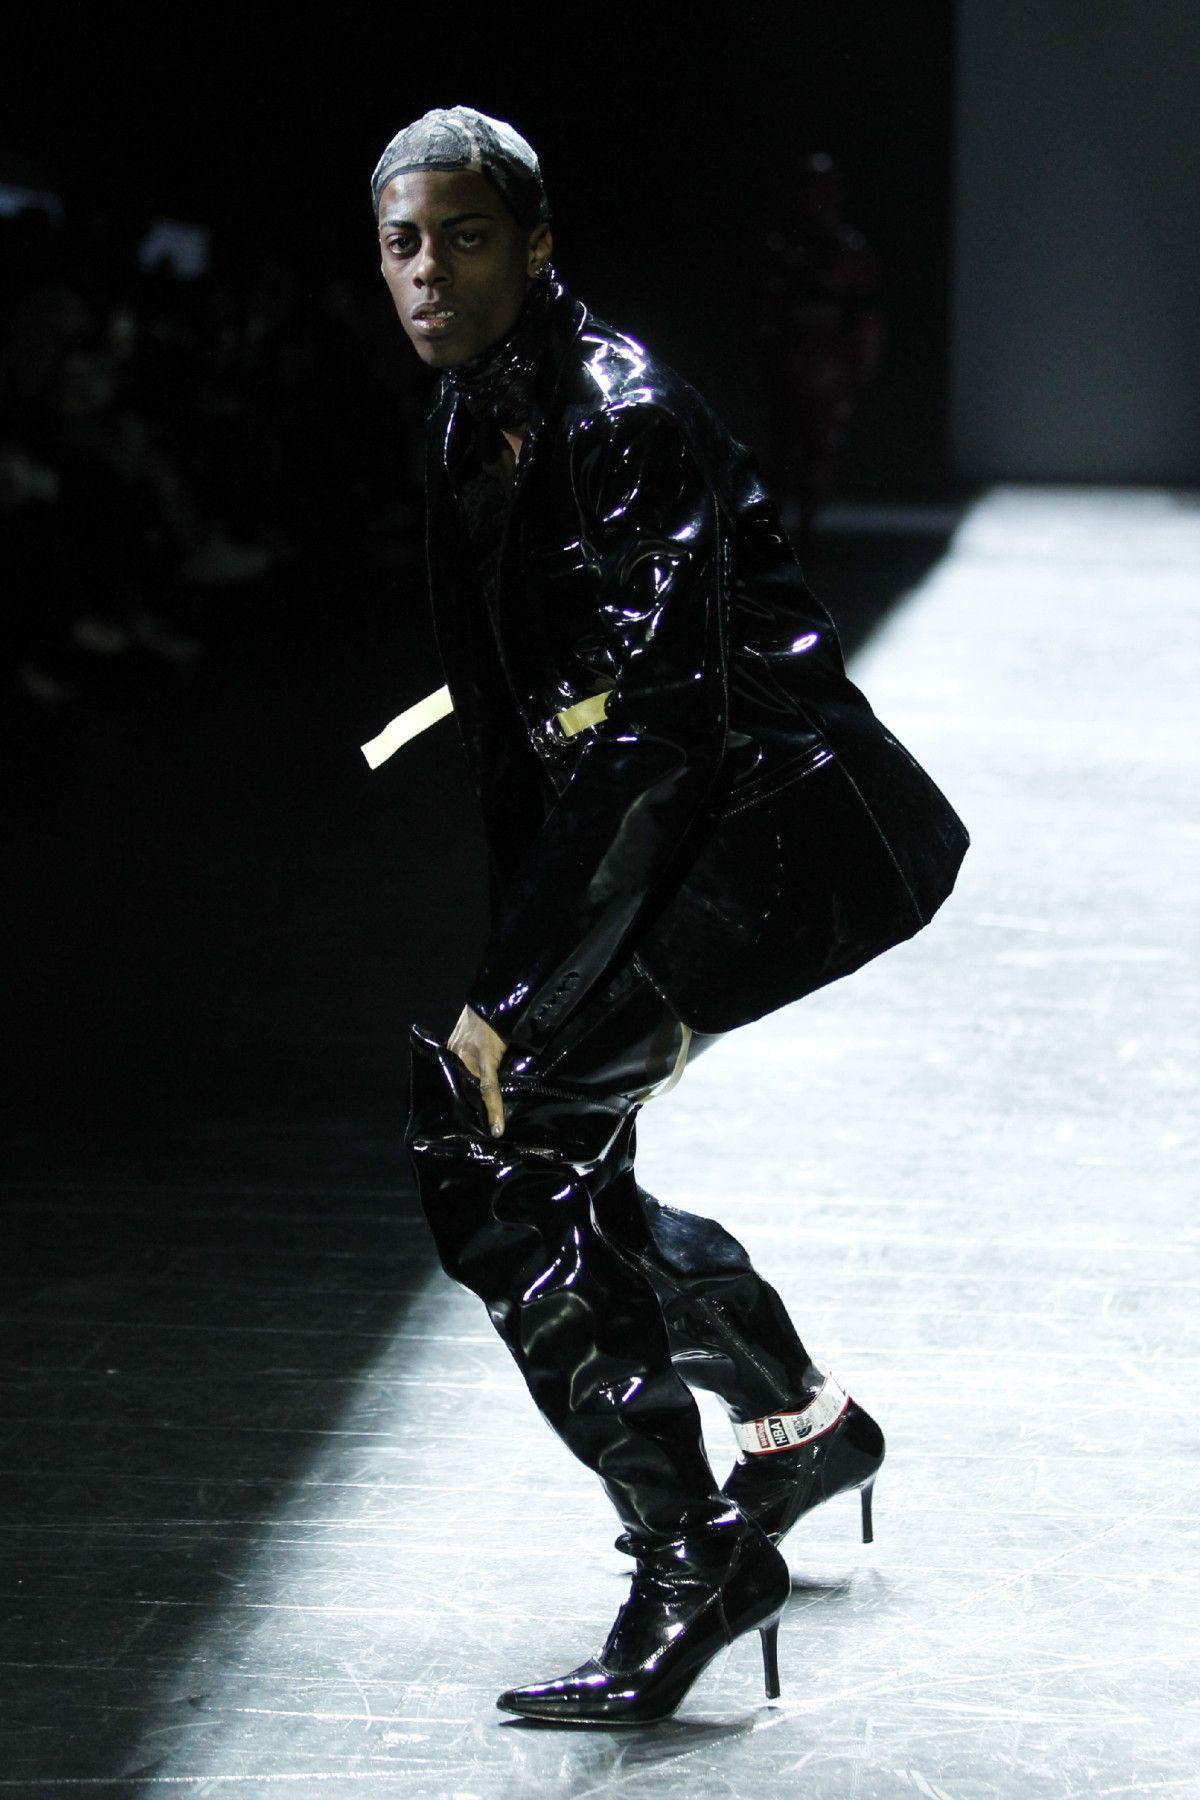 New York Fashion Week The Shows Hood by air, Fashion